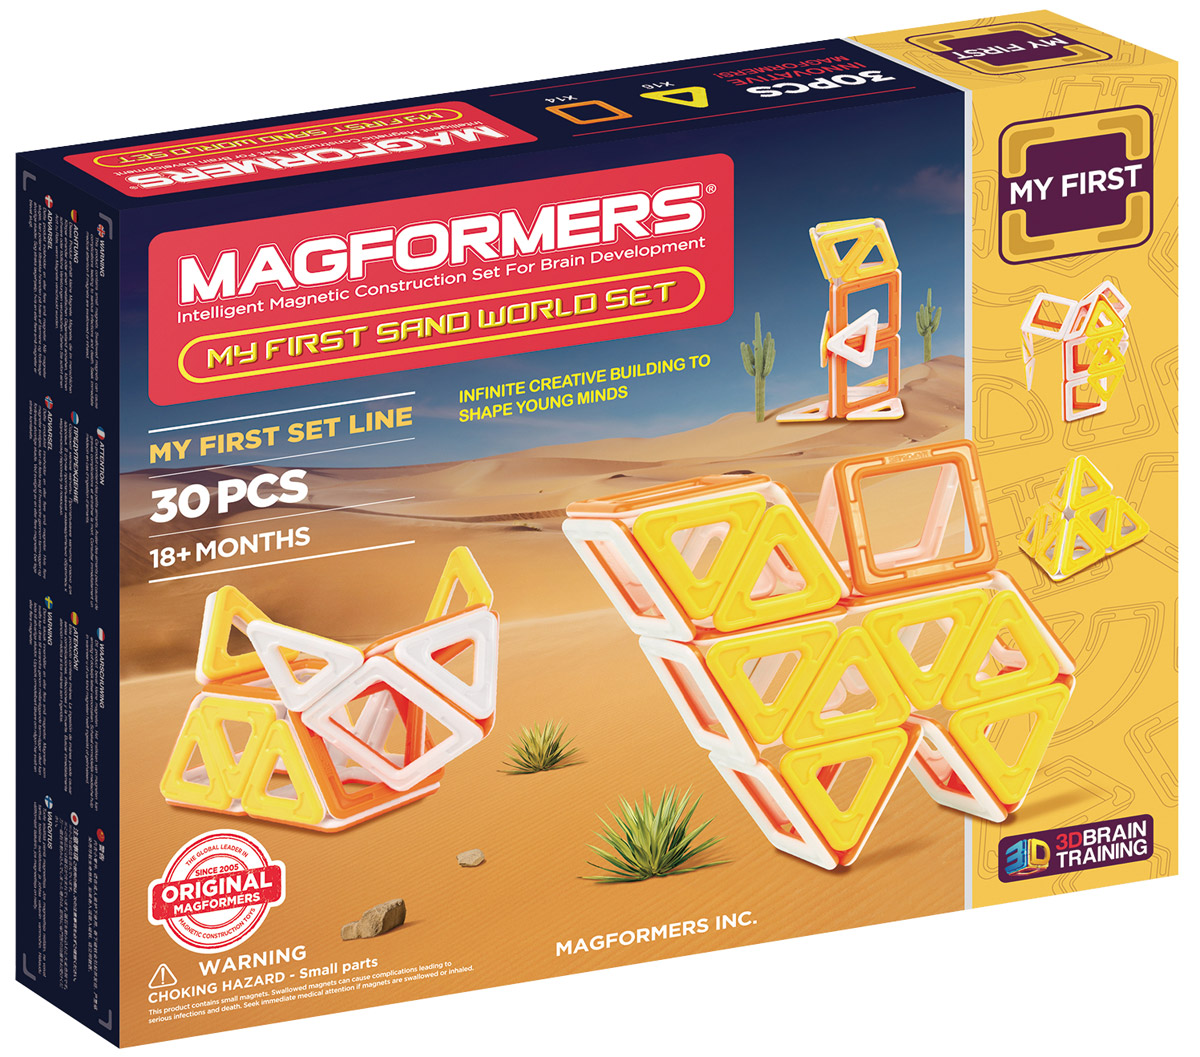 Magformers Магнитный конструктор My First Sand World Set magformers my first magformers 30